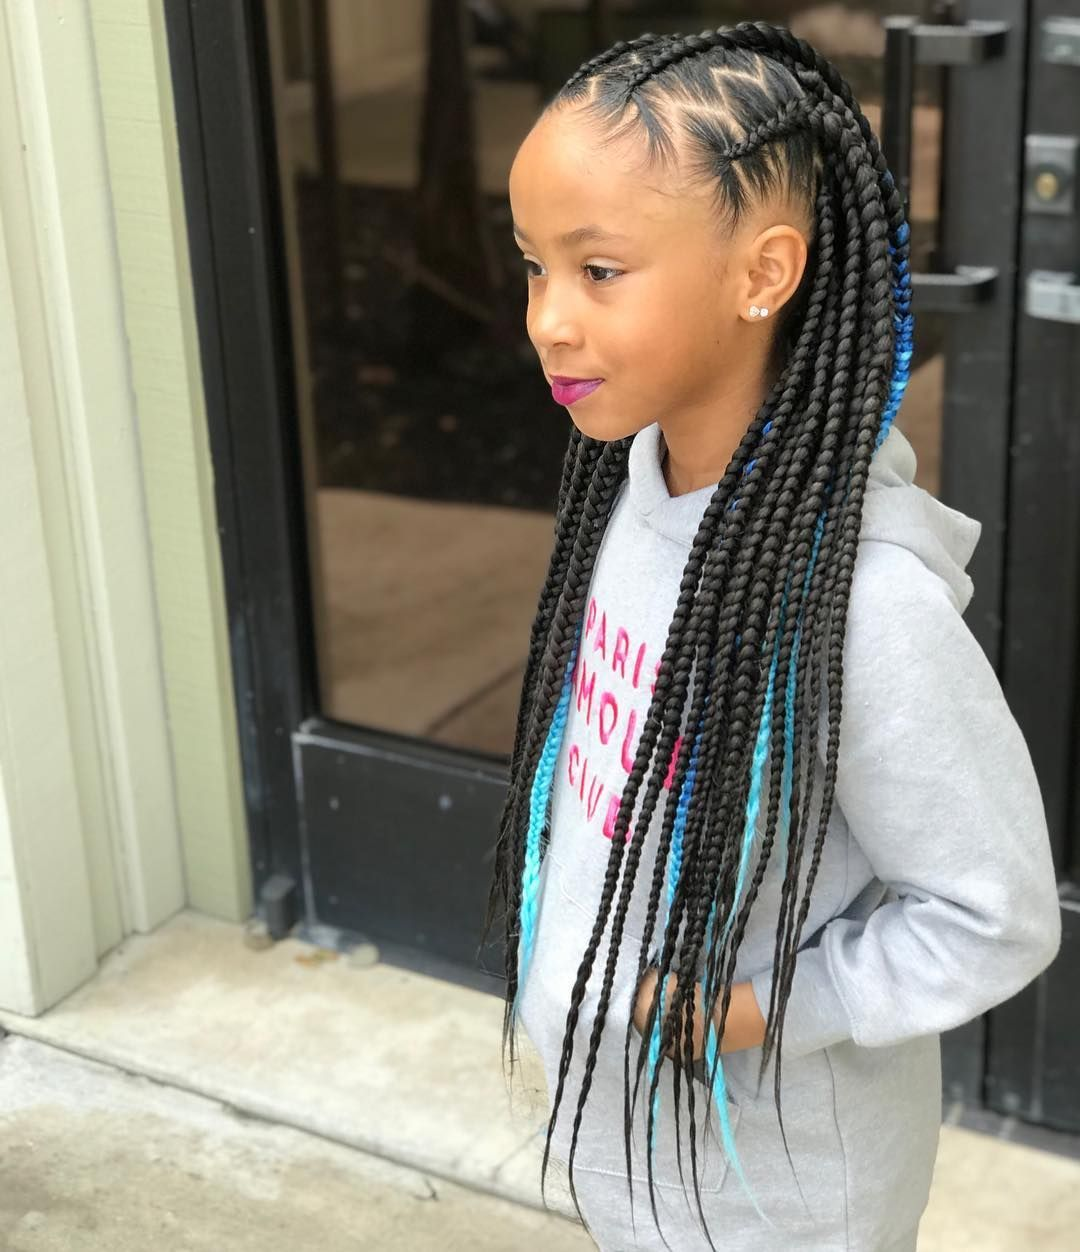 Sisterly Love On Instagram Sister Slay Hair By Redefined Studio Sistersister Black Girl Hairstyles For In 2020 Black Kids Hairstyles Kids Hairstyles Hair Styles